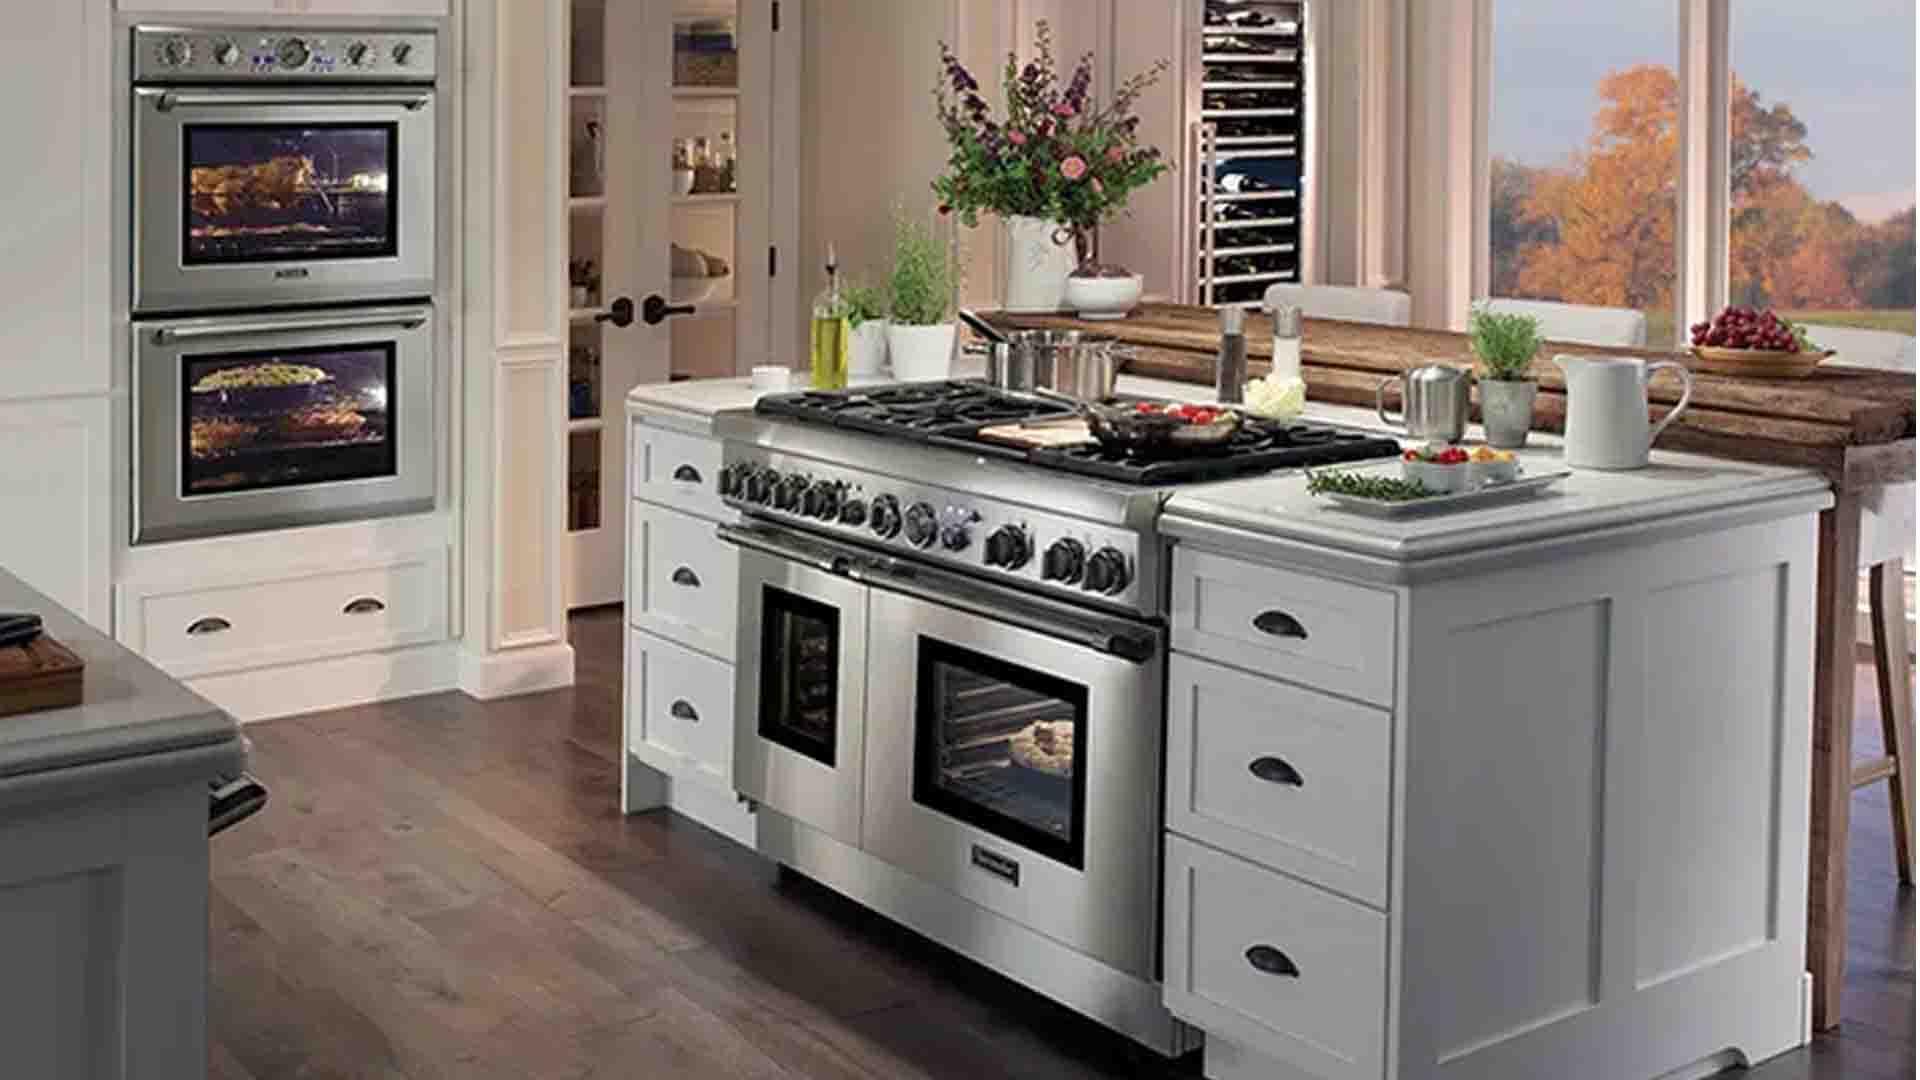 Thermador Oven Repair Service | Thermador Appliance Repair Pros